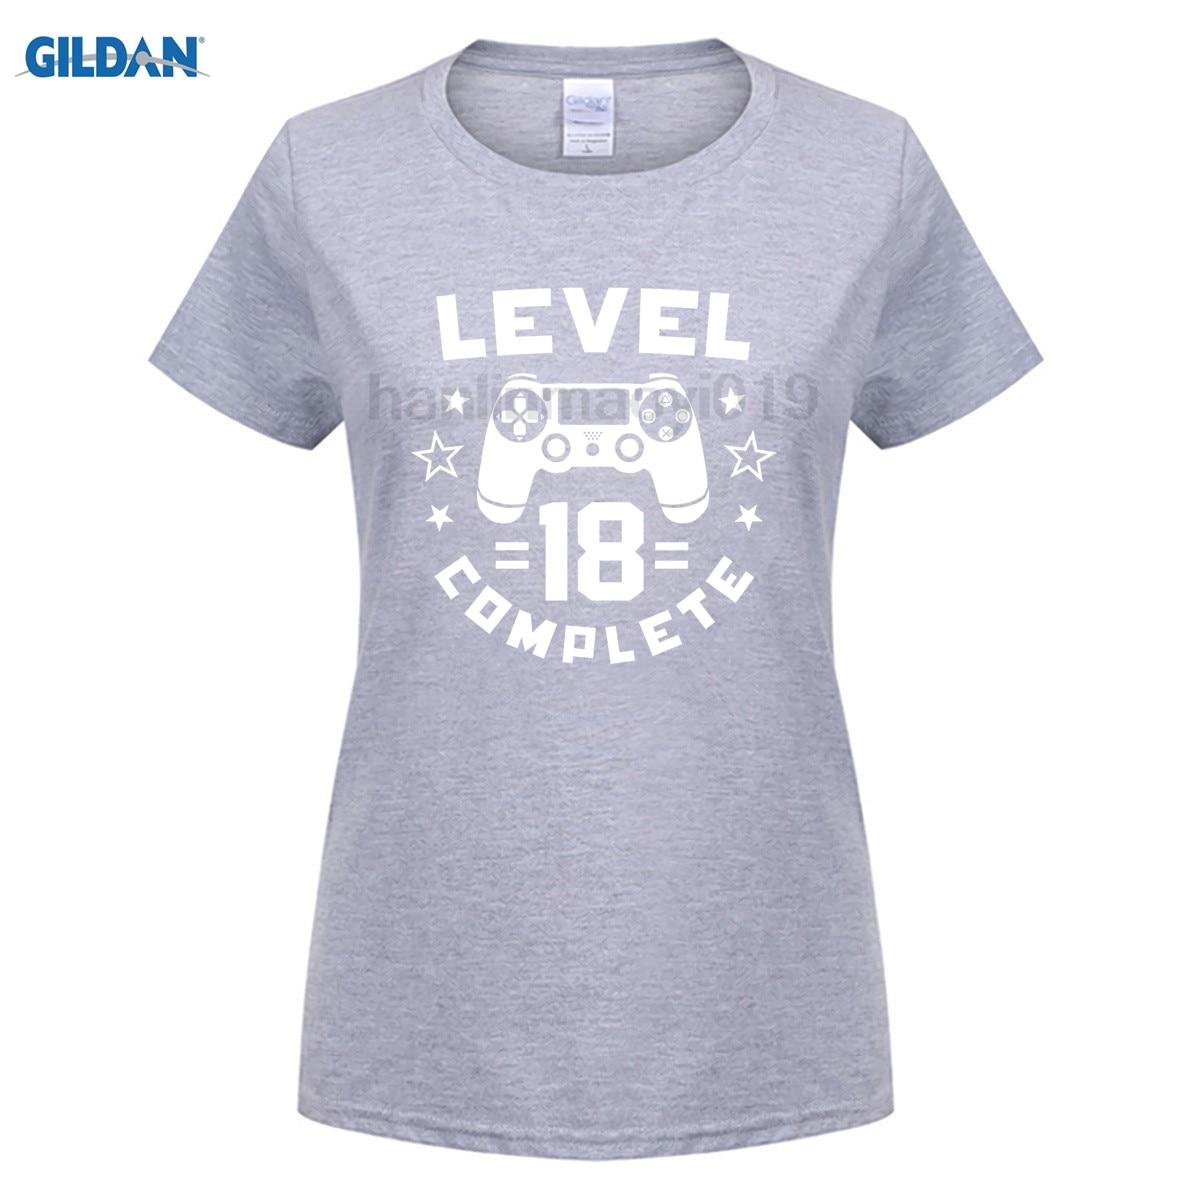 GILDAN Level 18 Complete Video Gamer Geek Boys 18th Birthday Shirt Latest Fun T-shirt Top Casual Wear